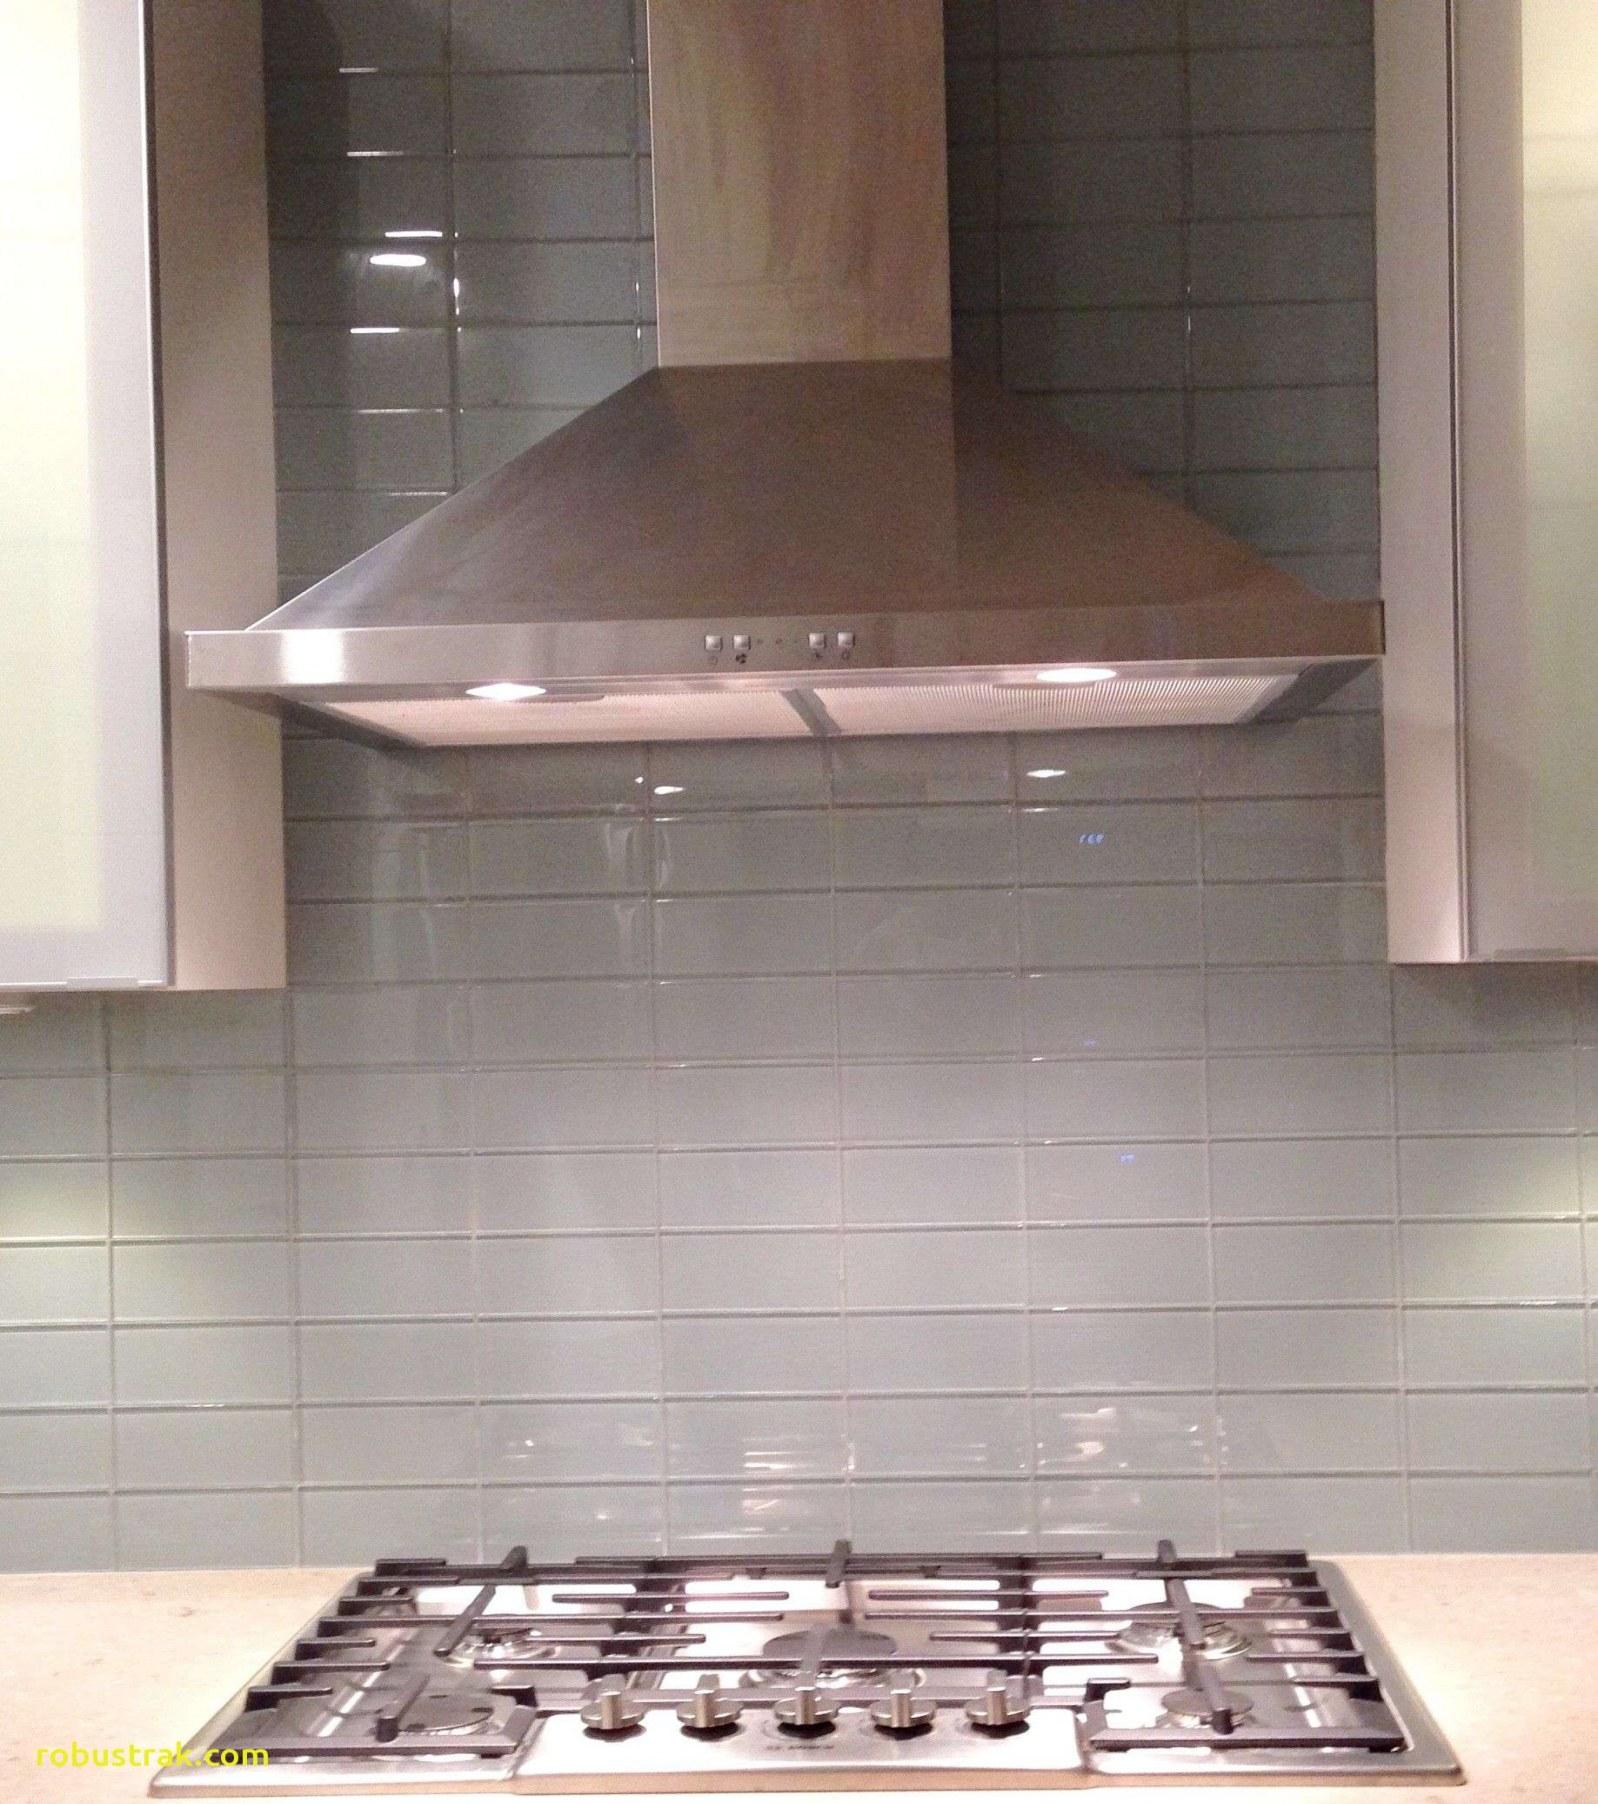 herringbone subway tile backsplash grey gl subway tile in kitchen kitchen appliances tips and of herringbone subway tile backsplash